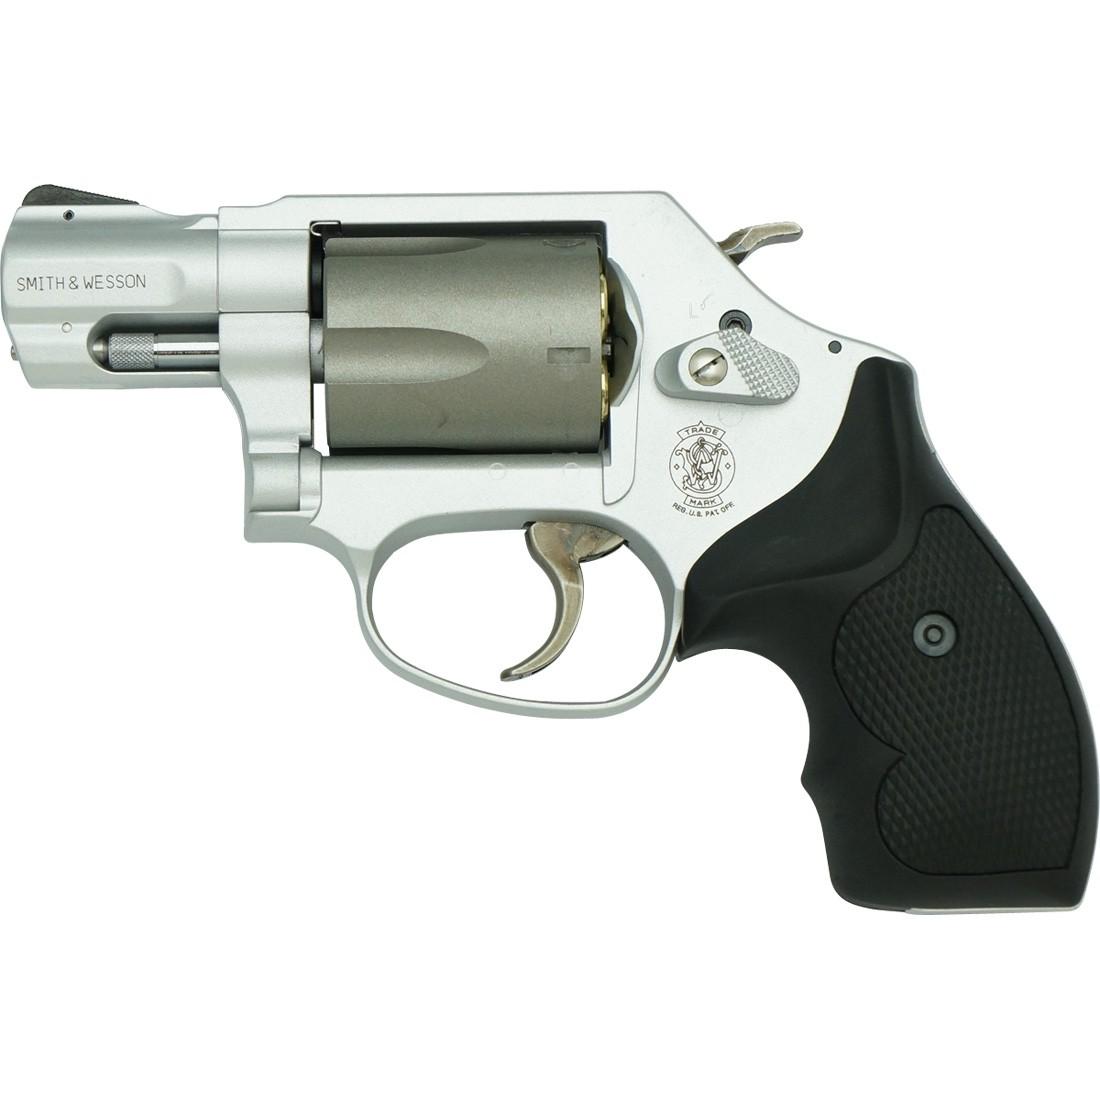 "Tanaka S&W M360 SC .357 Magnum 2"" ABS + Cerakote Airsoft Revolver"